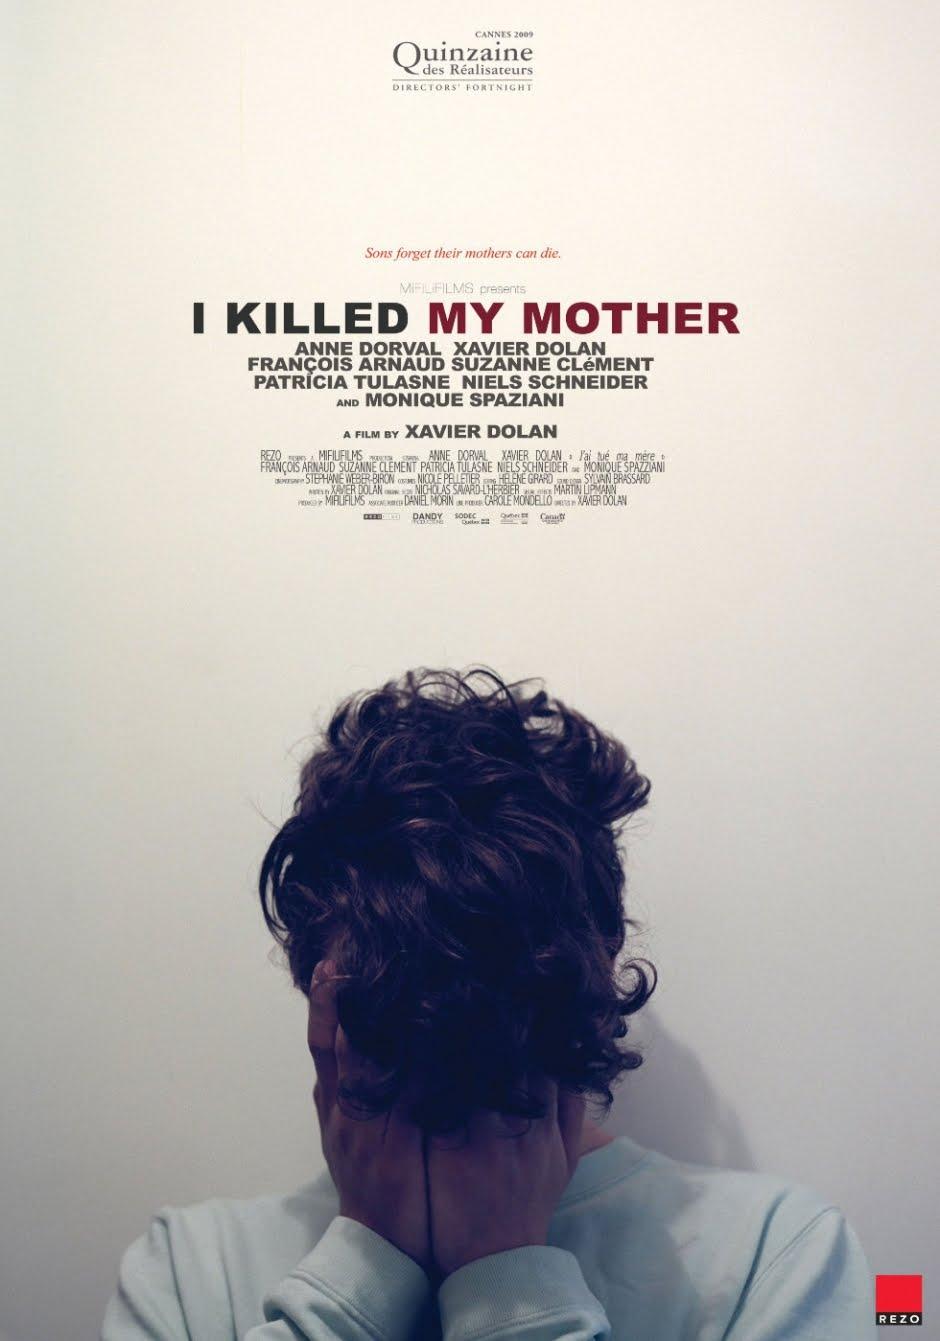 Sydney Film Festival: 10 I've already seen | A Life In Film